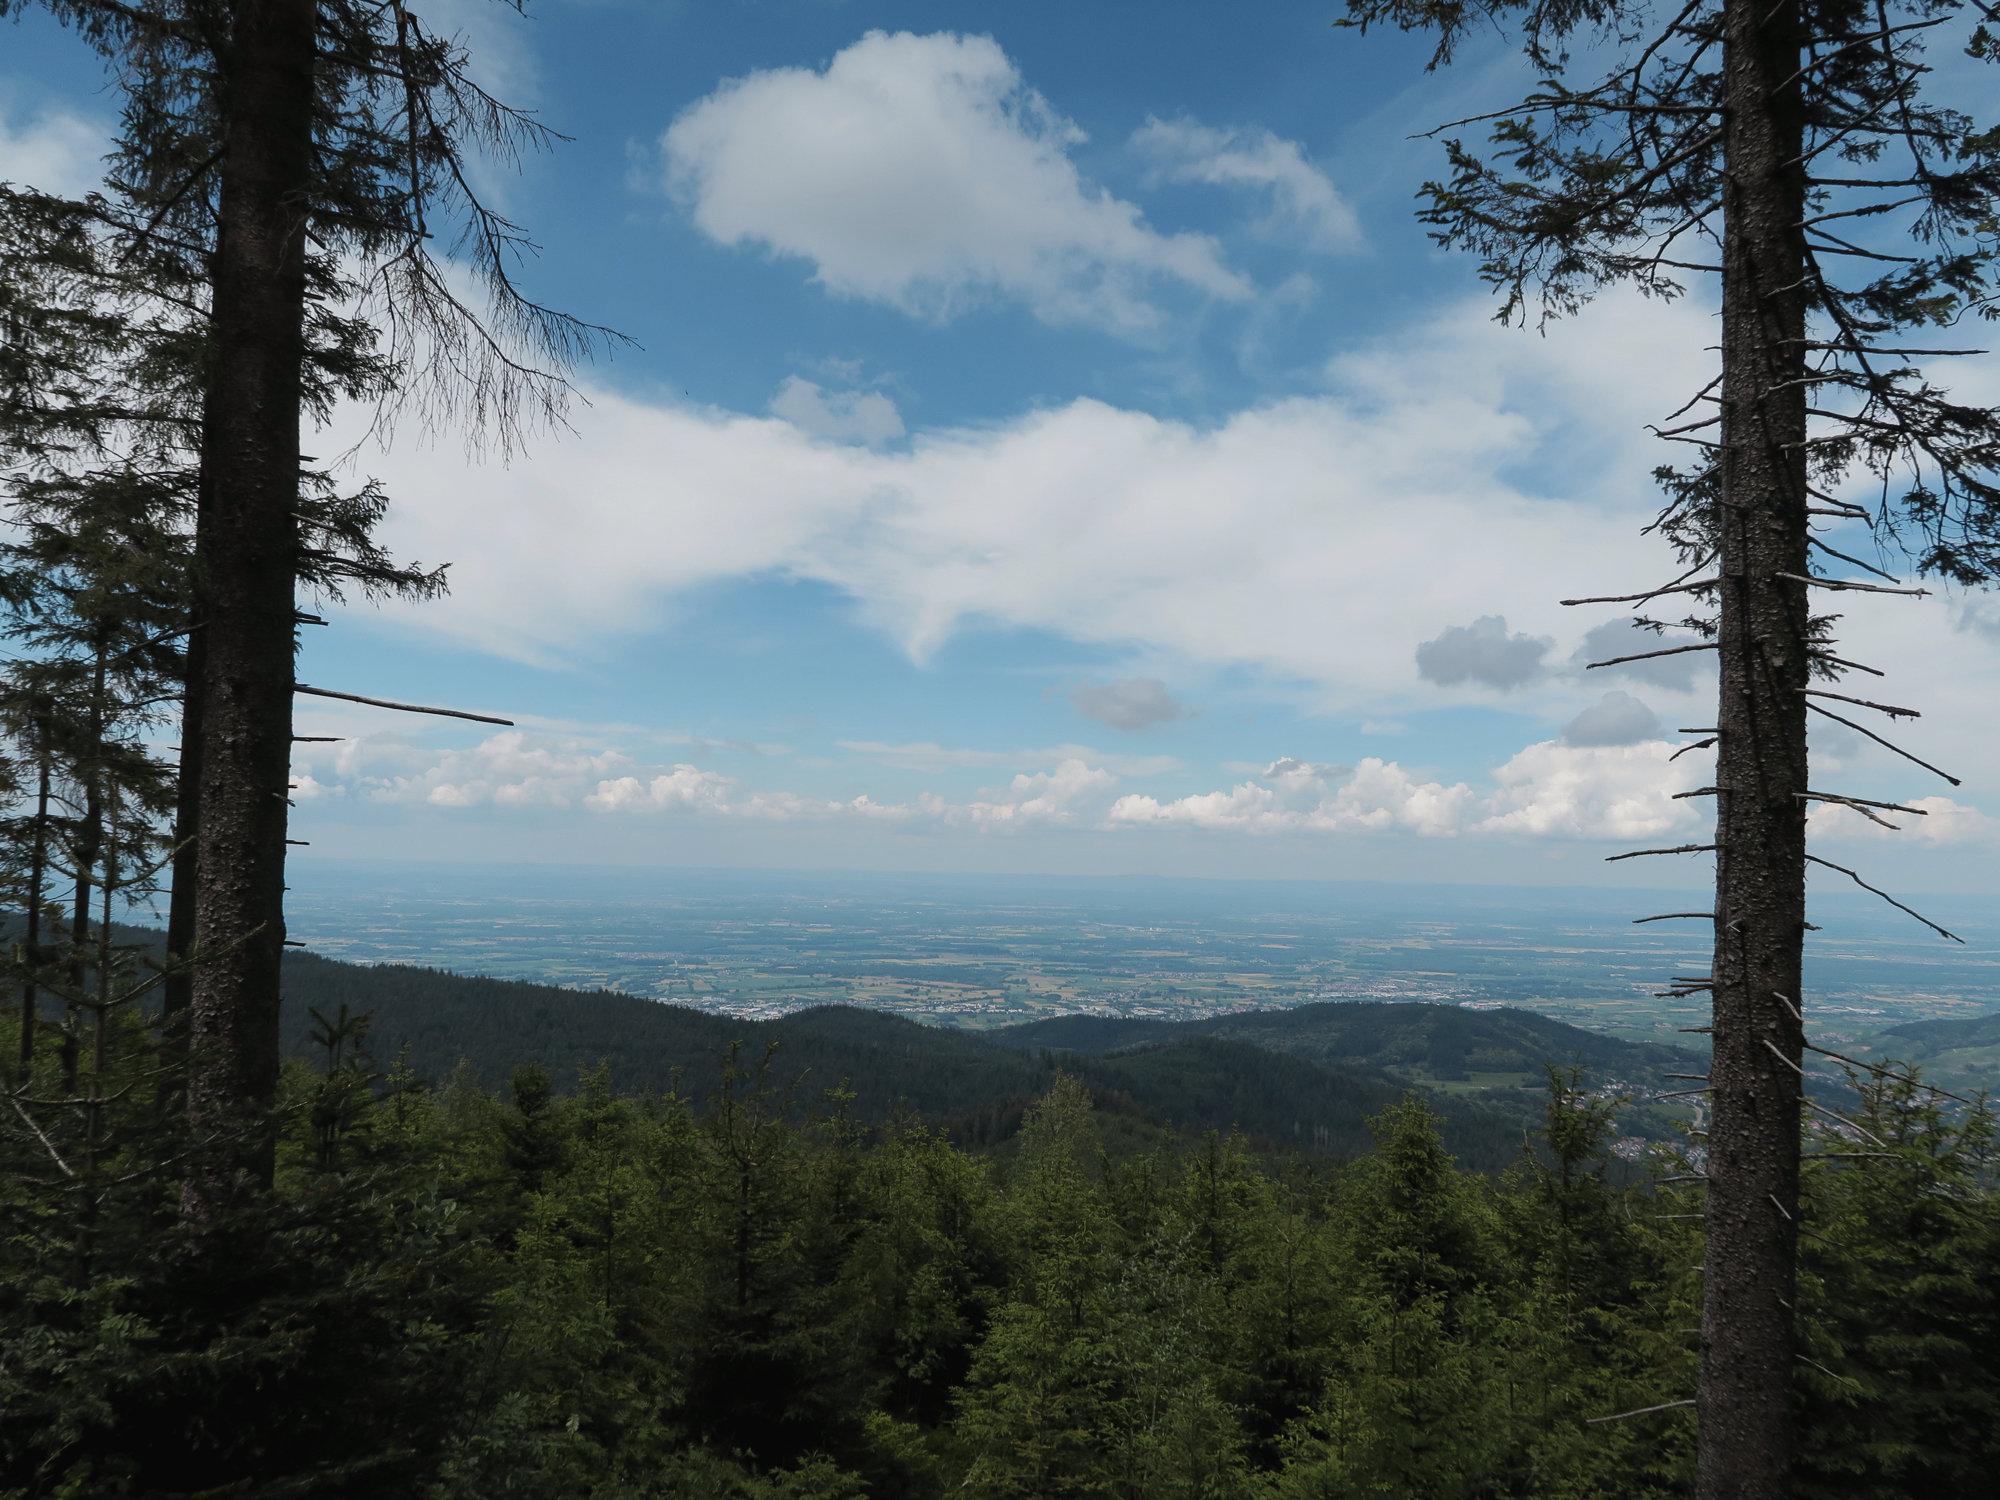 Ausblick im Schwarzwald, Trekking, Wanderung